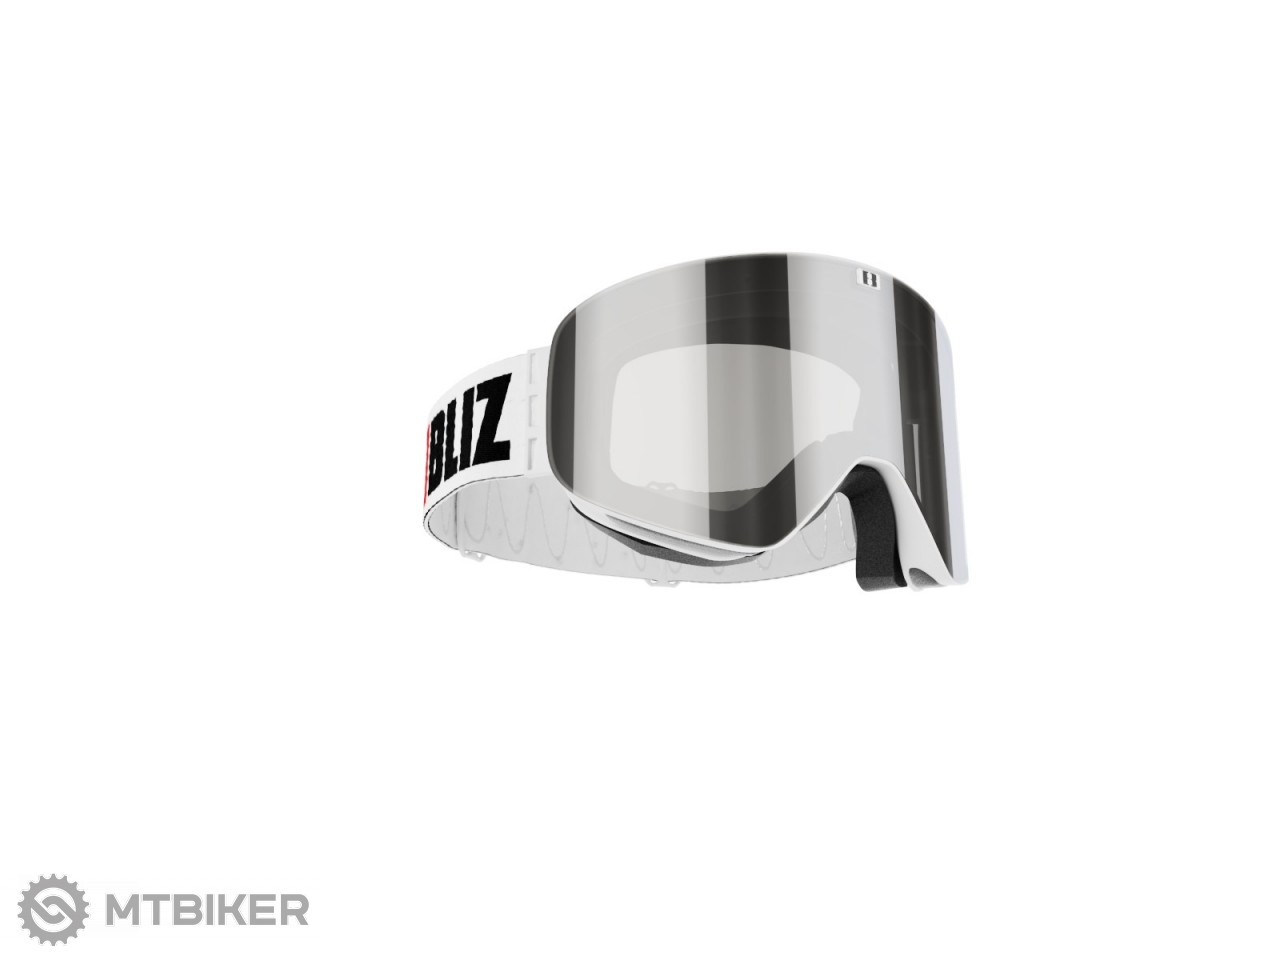 0f62a48b6 Bliz FLOW White brown, silver Mirror lyžiarske okuliare - MTBIKER Shop